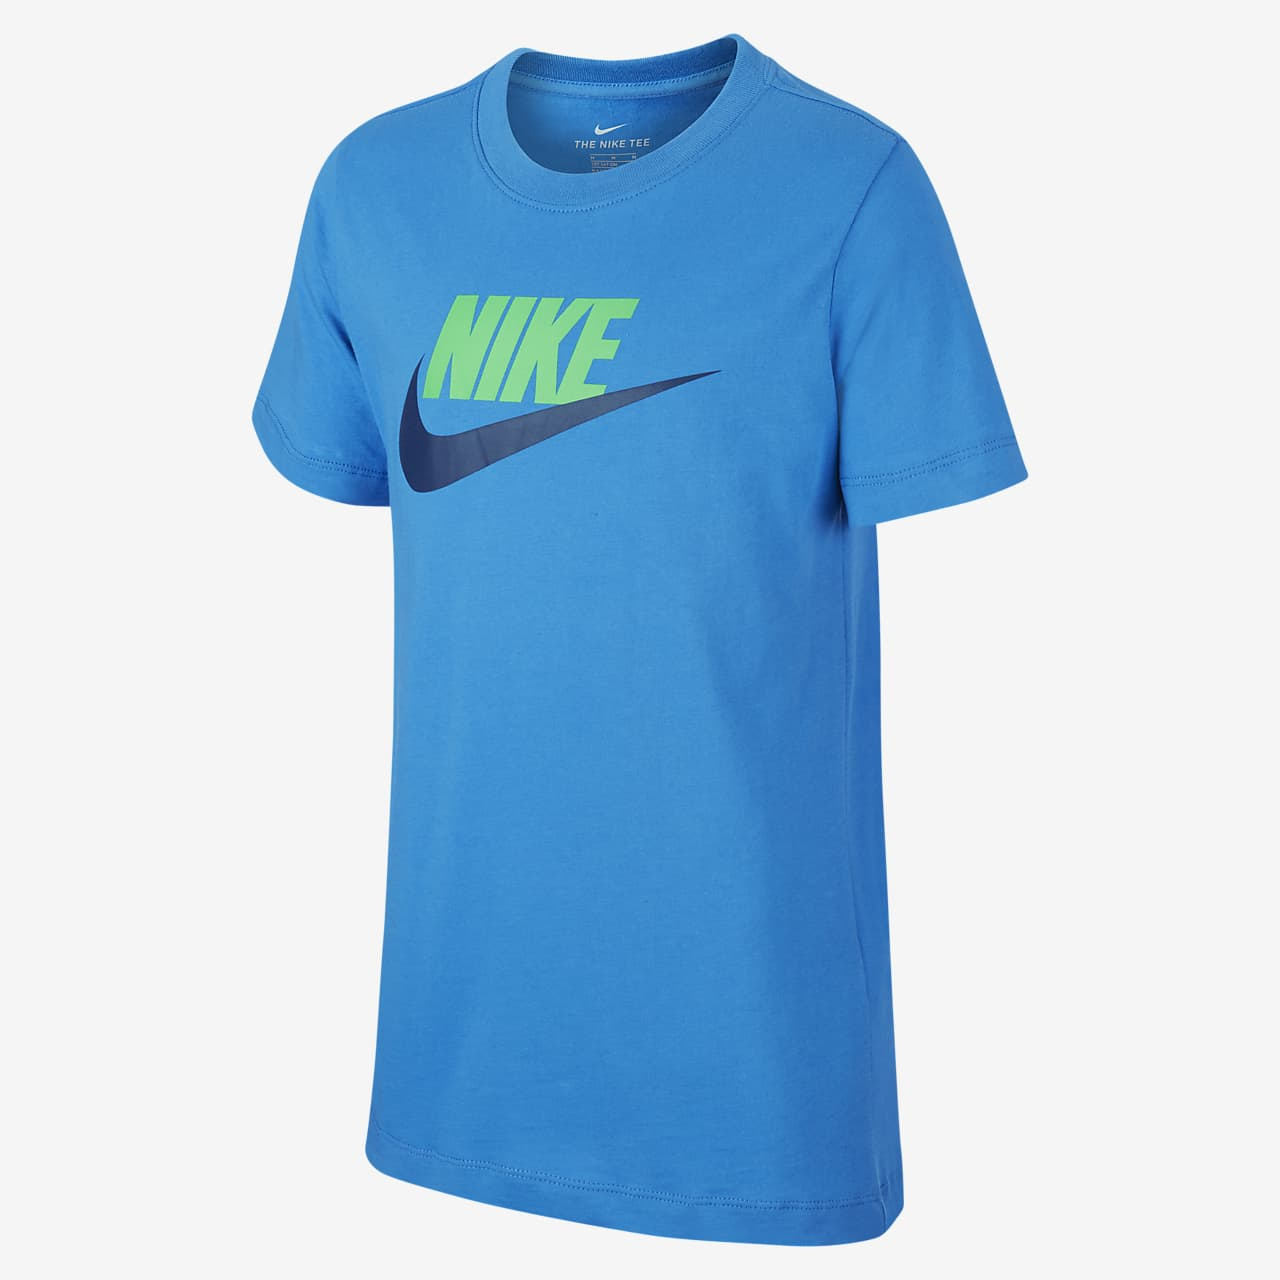 Nike Sportswear-T-shirt i bomuld til store børn